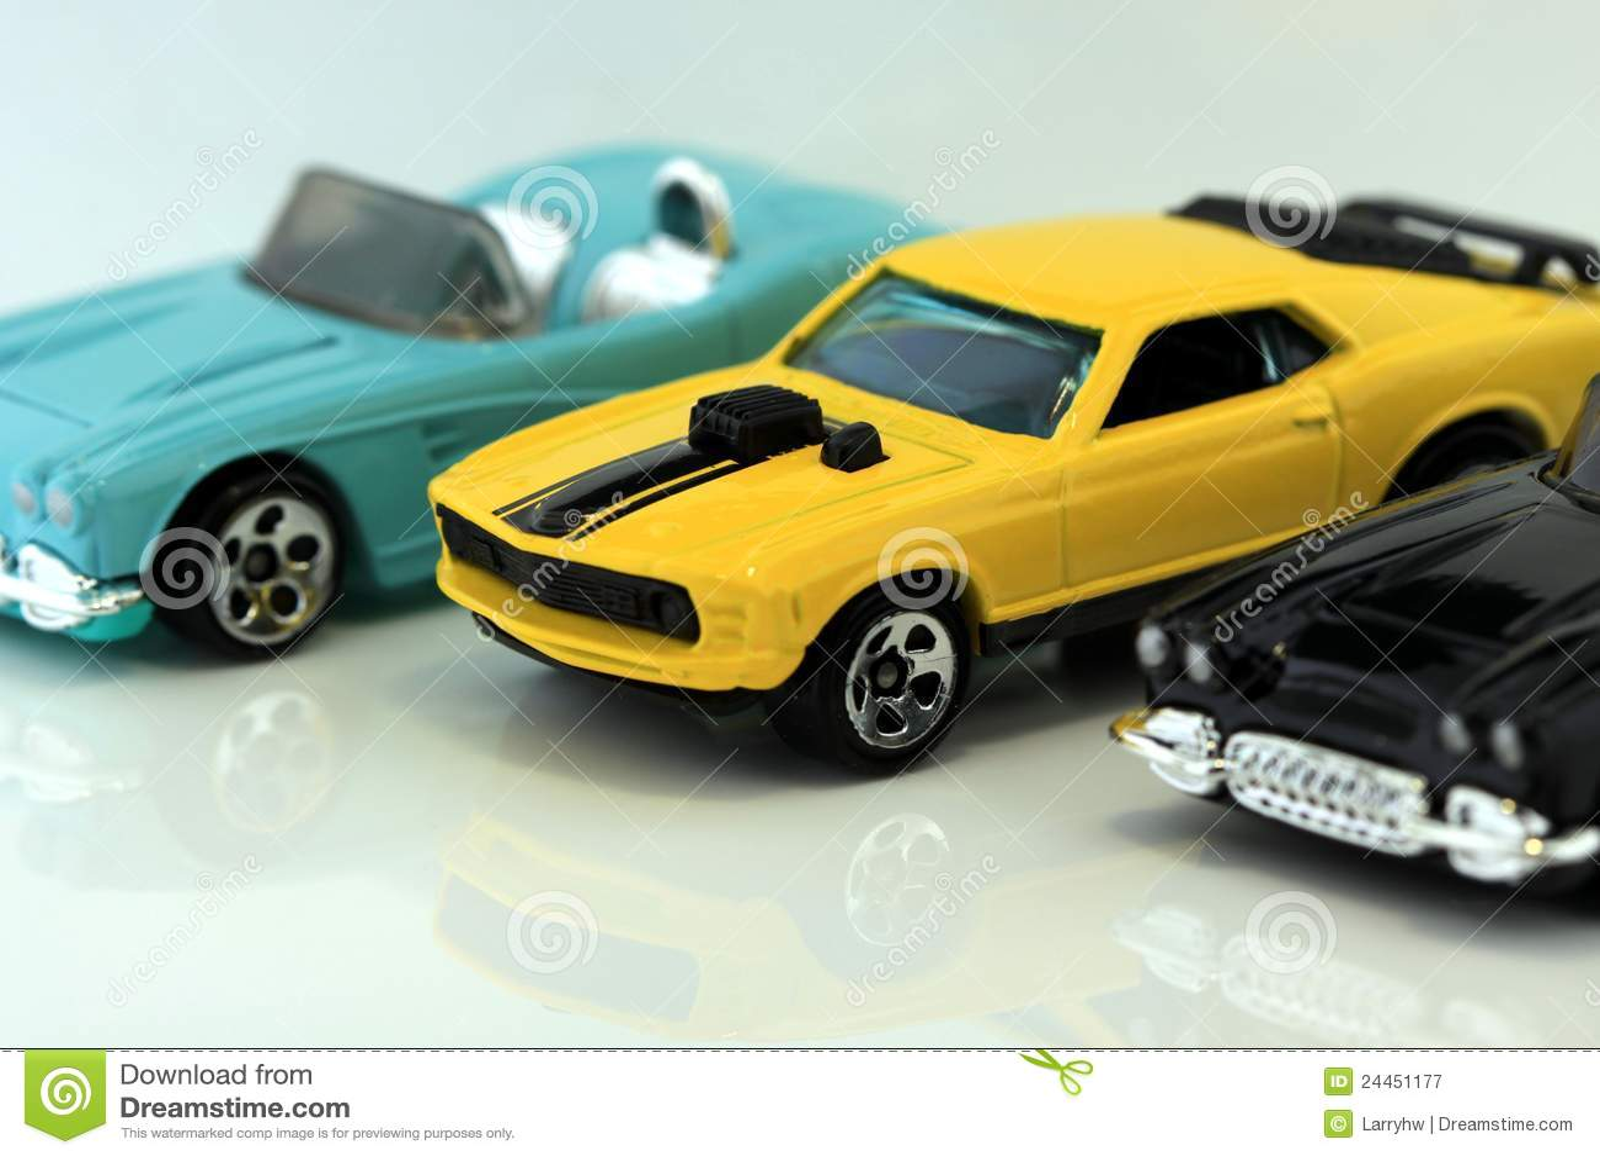 American Classic Sport Cars Three classic american sports